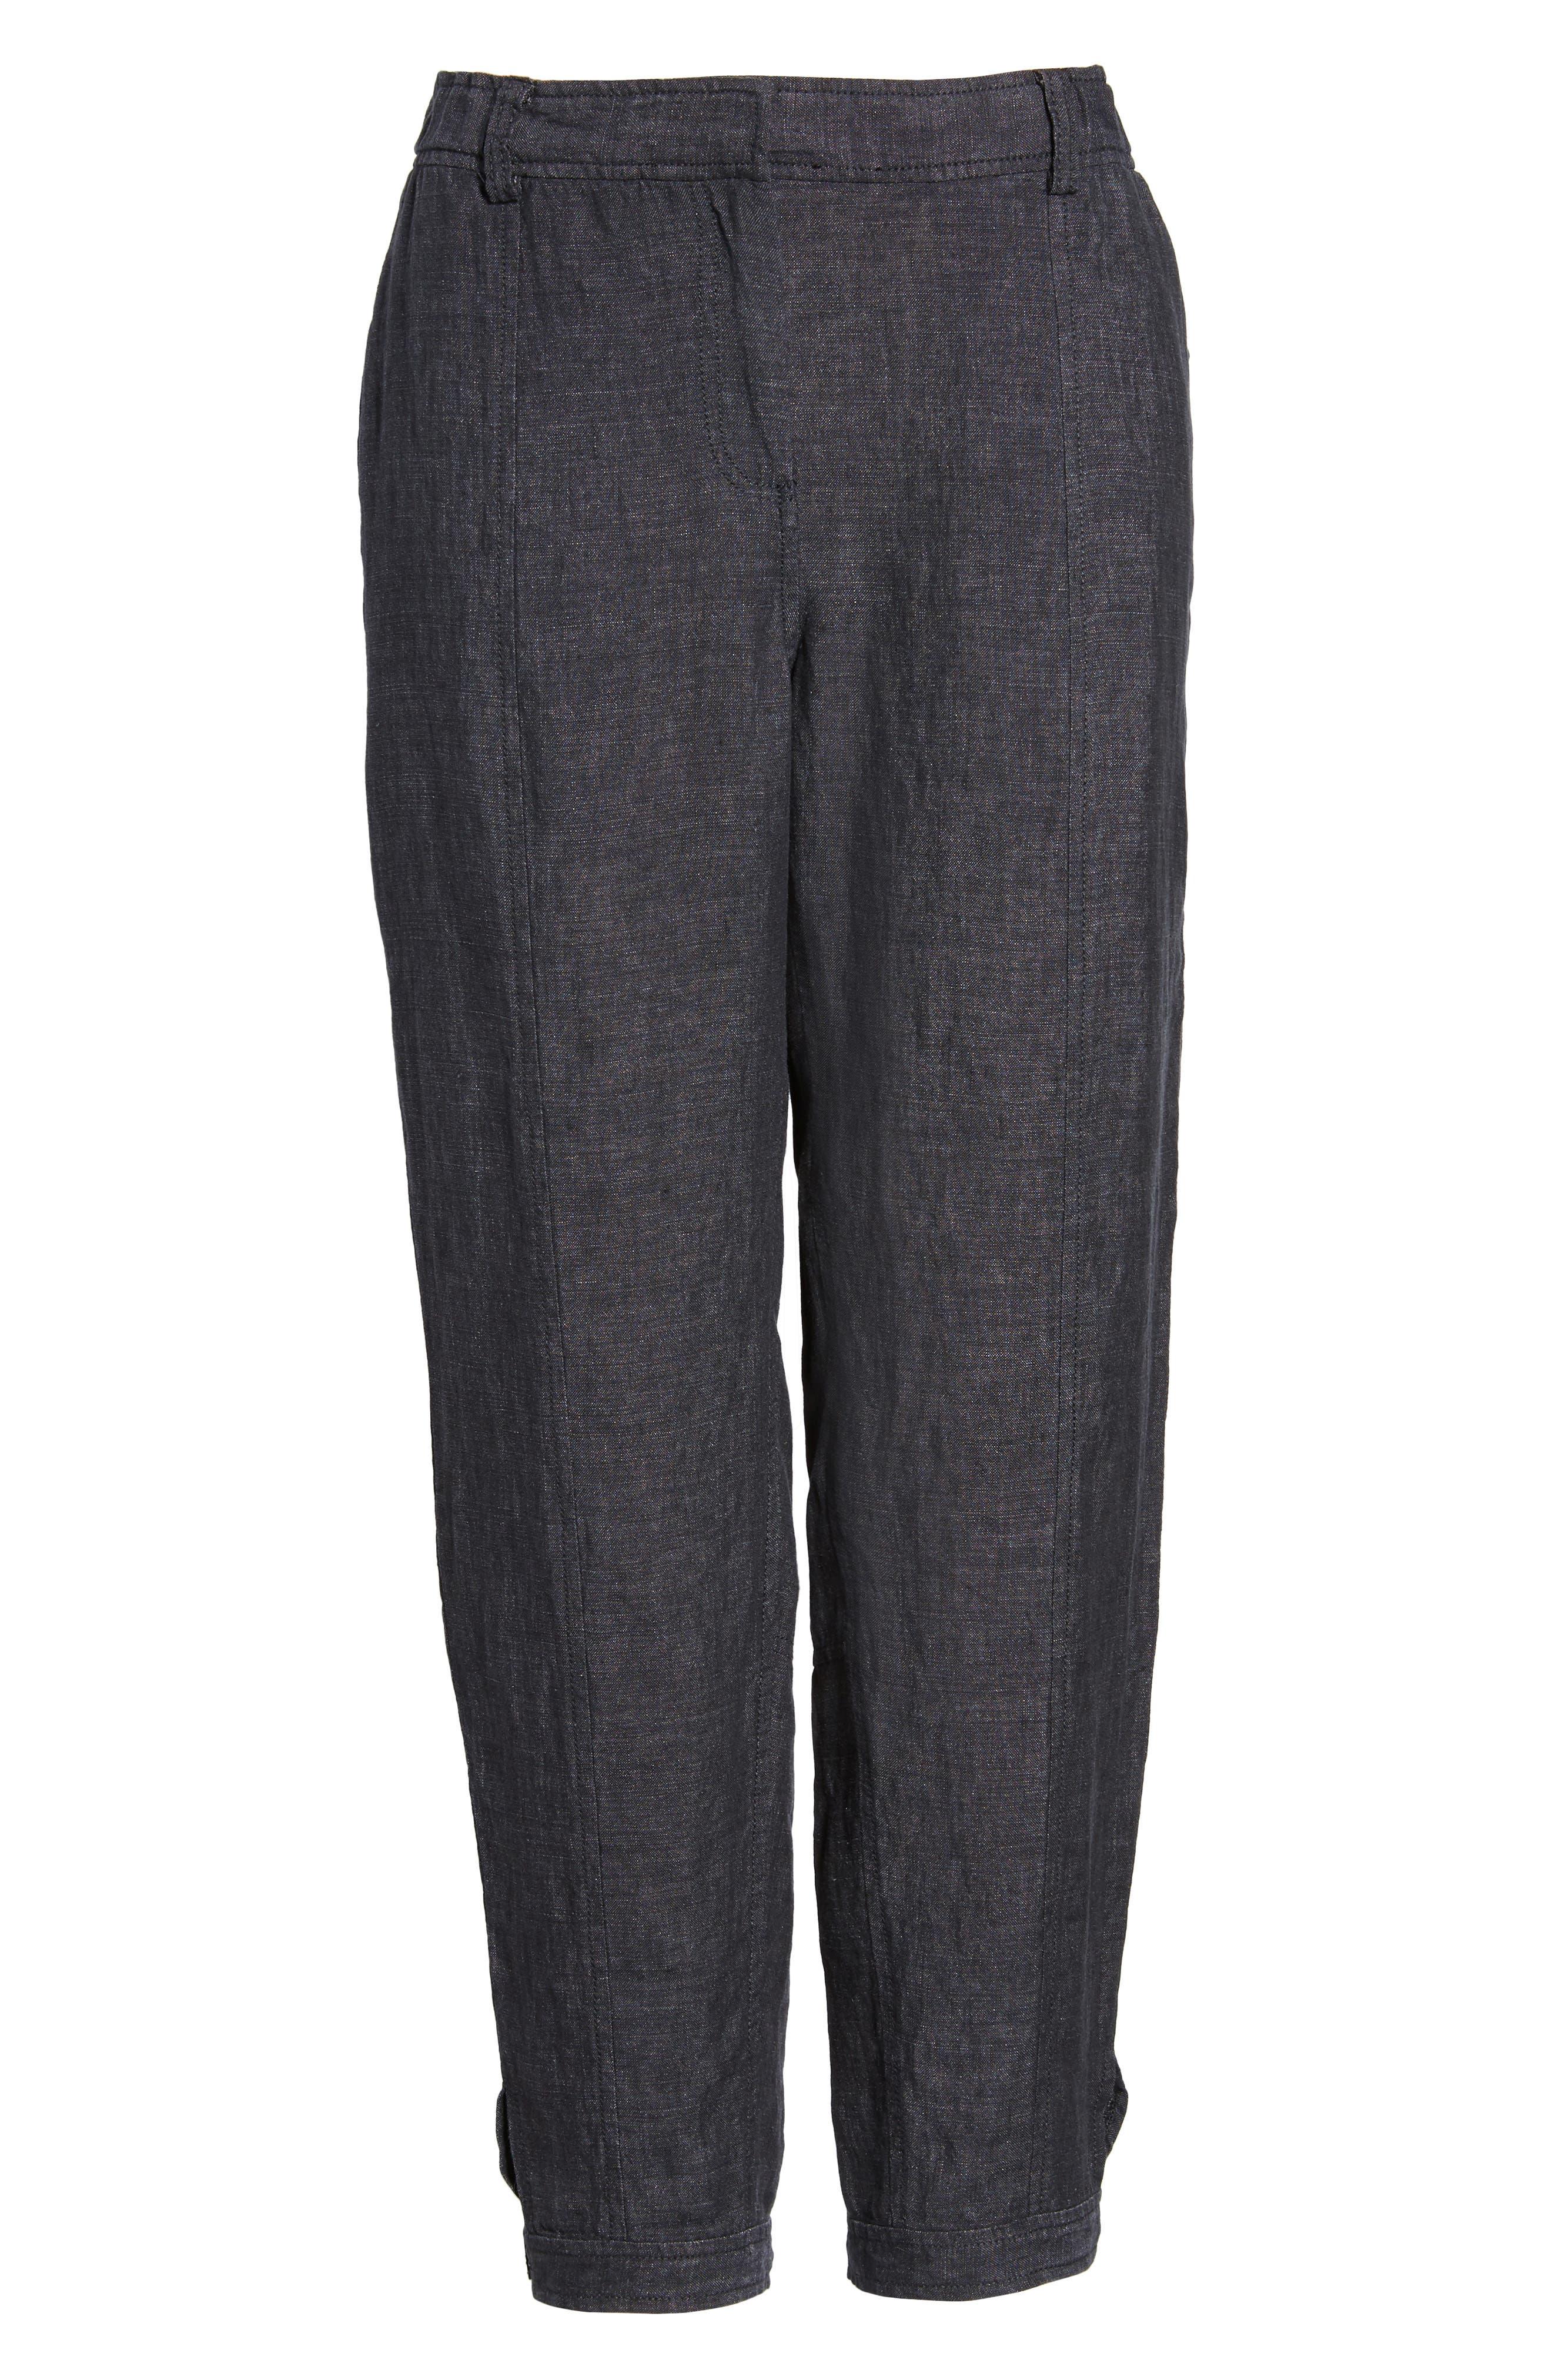 Easy Ankle Organic Linen Pants,                             Alternate thumbnail 7, color,                             080